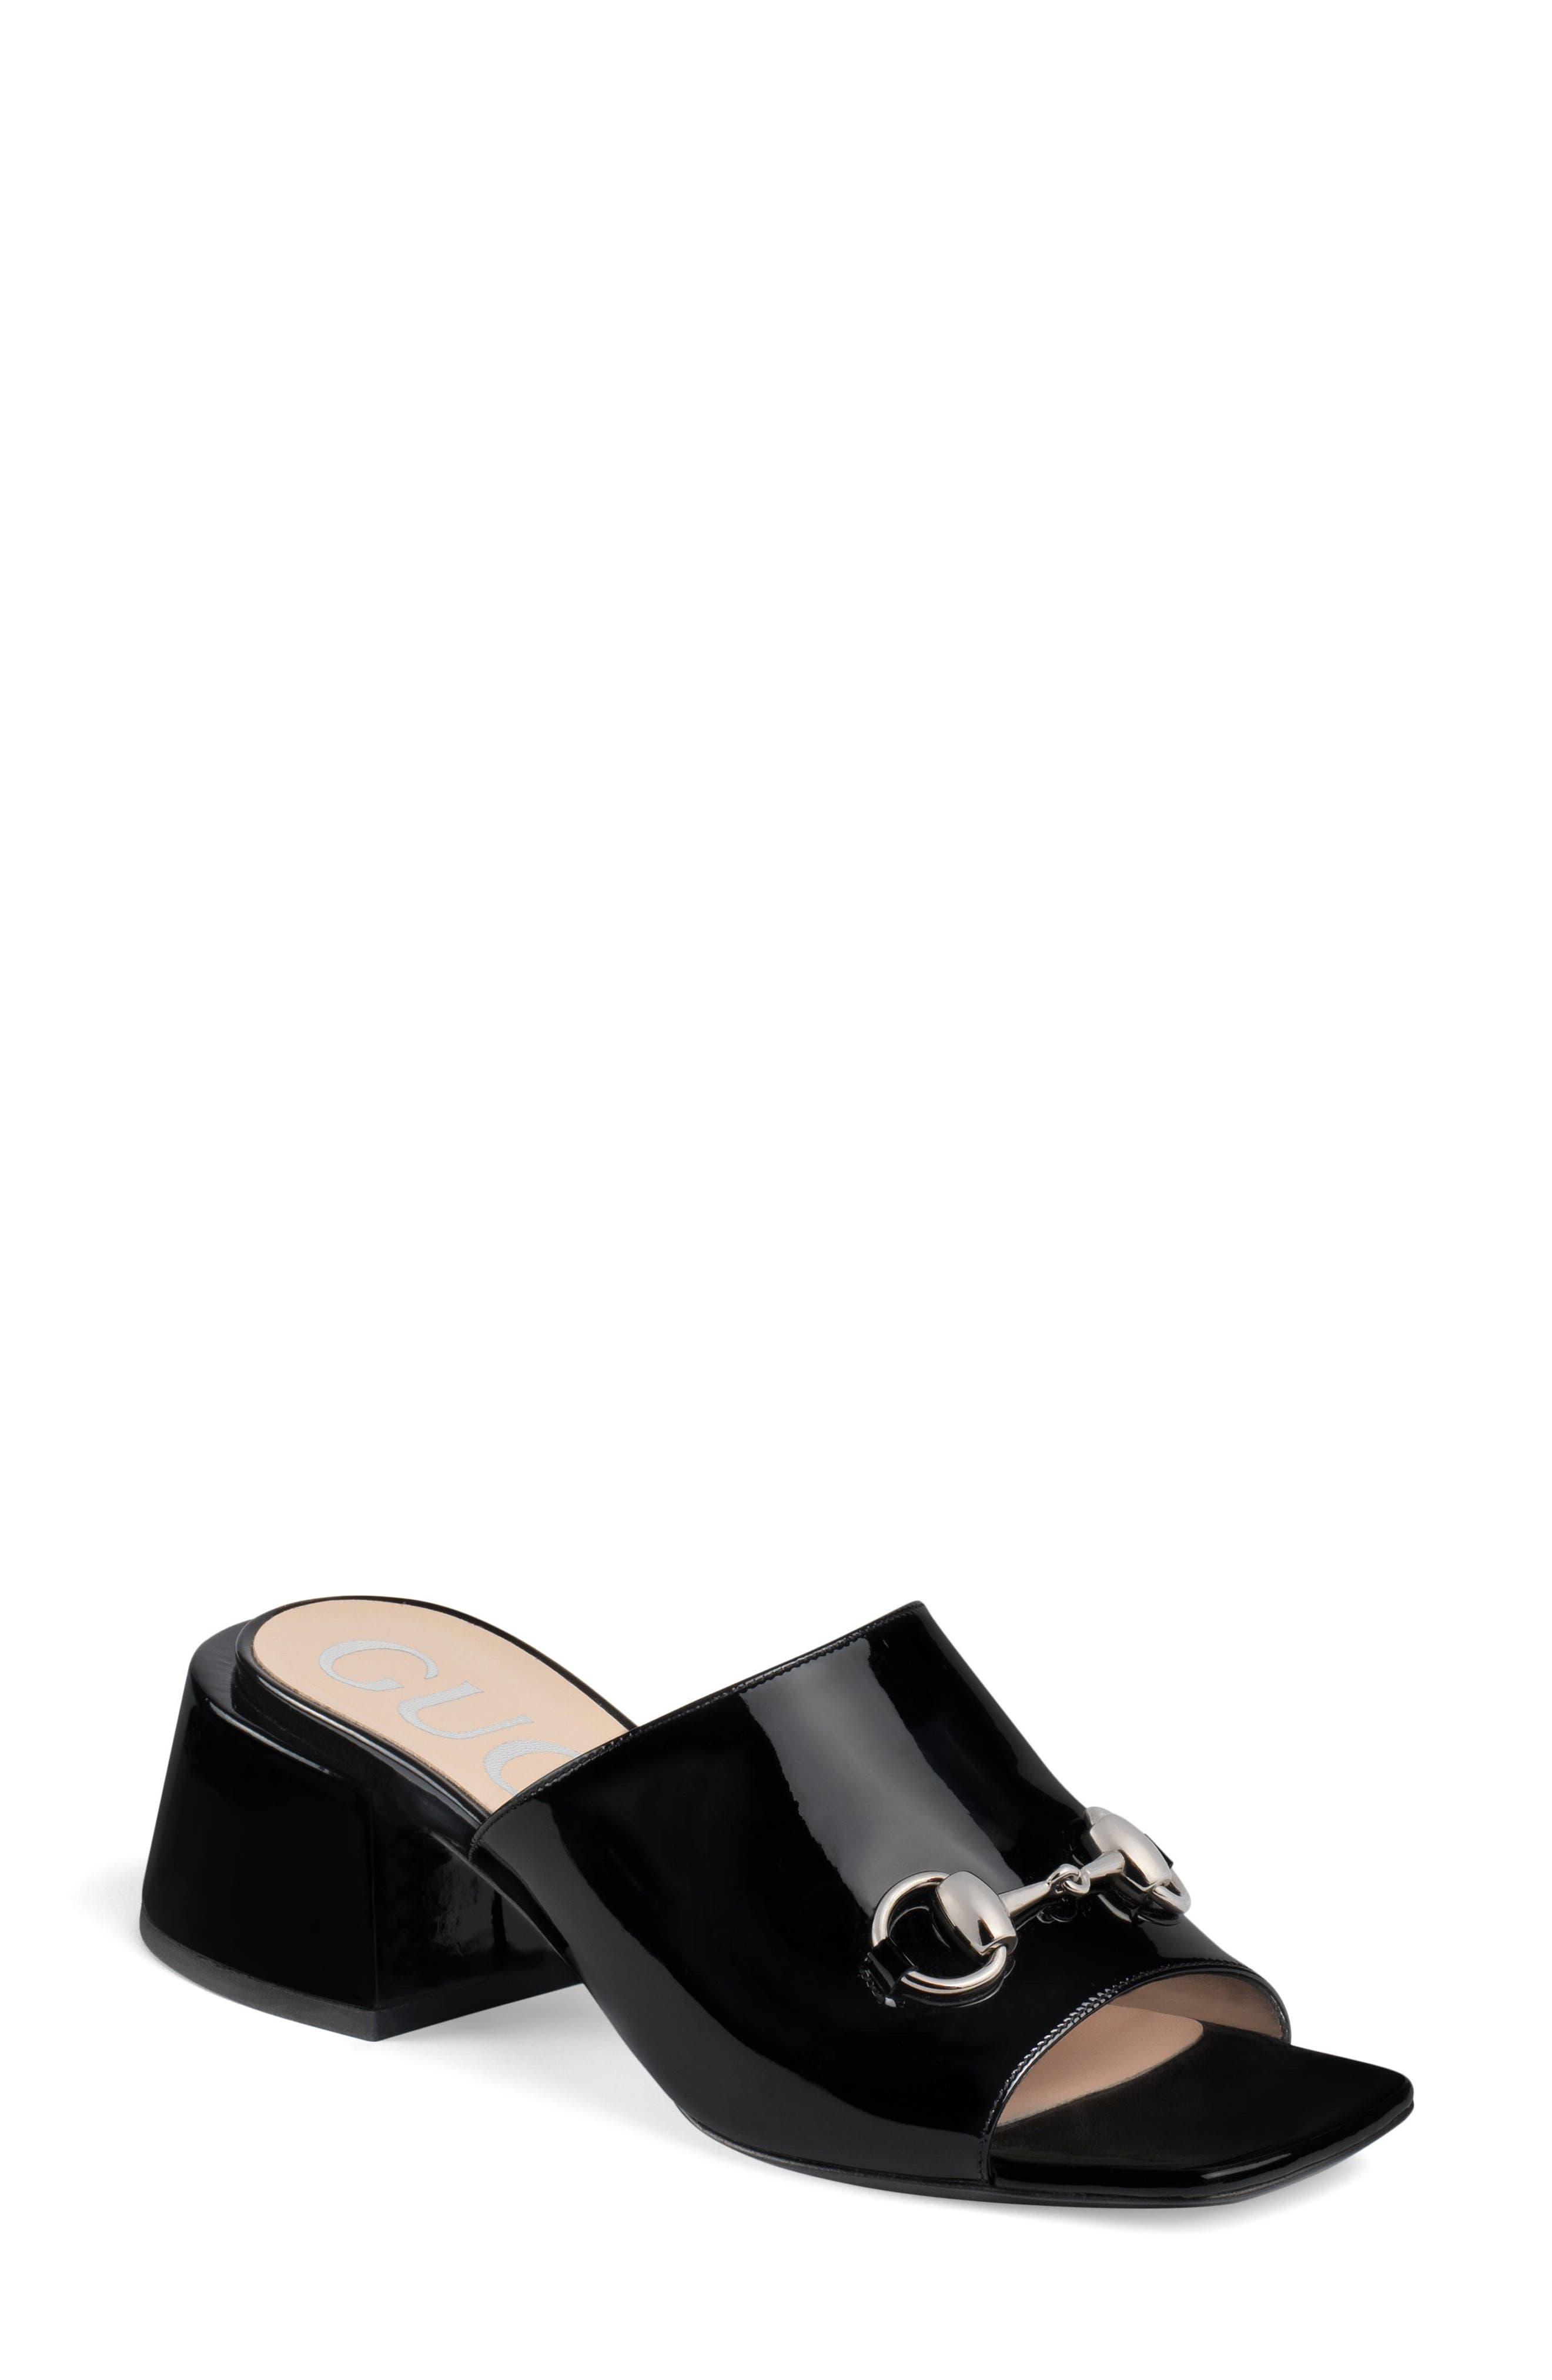 8375ce9bbd6a Gucci Lexi Slide Sandal - Black